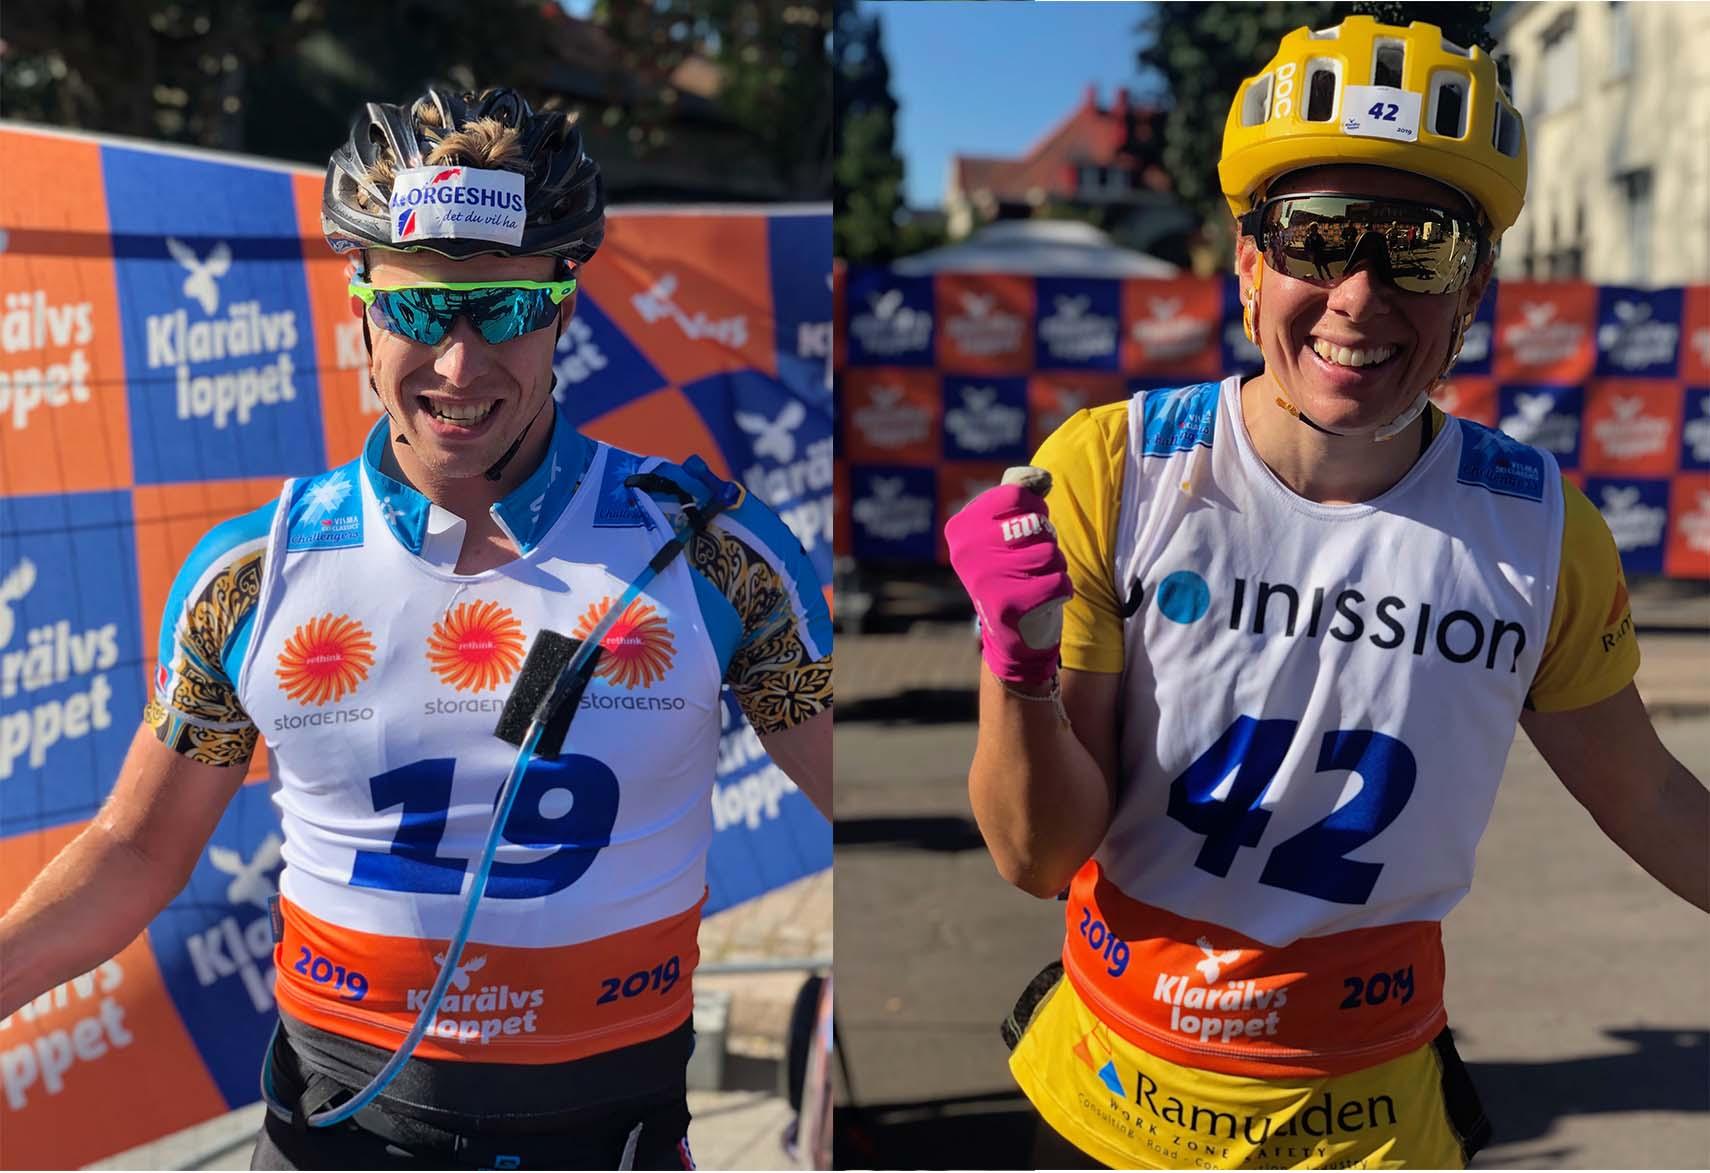 Segrare Klarälvsloppet Roller Ski 90K 2019